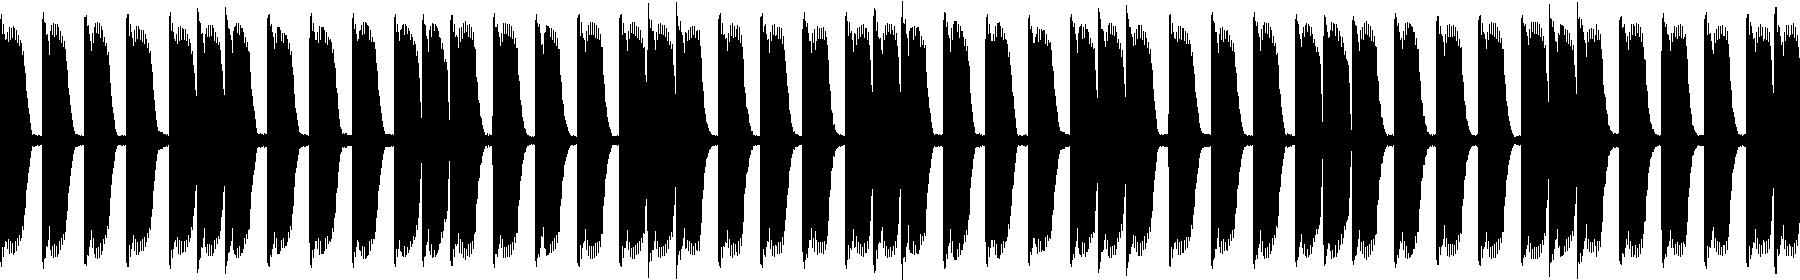 vedh melodyloop 019 cm a g 122bpm